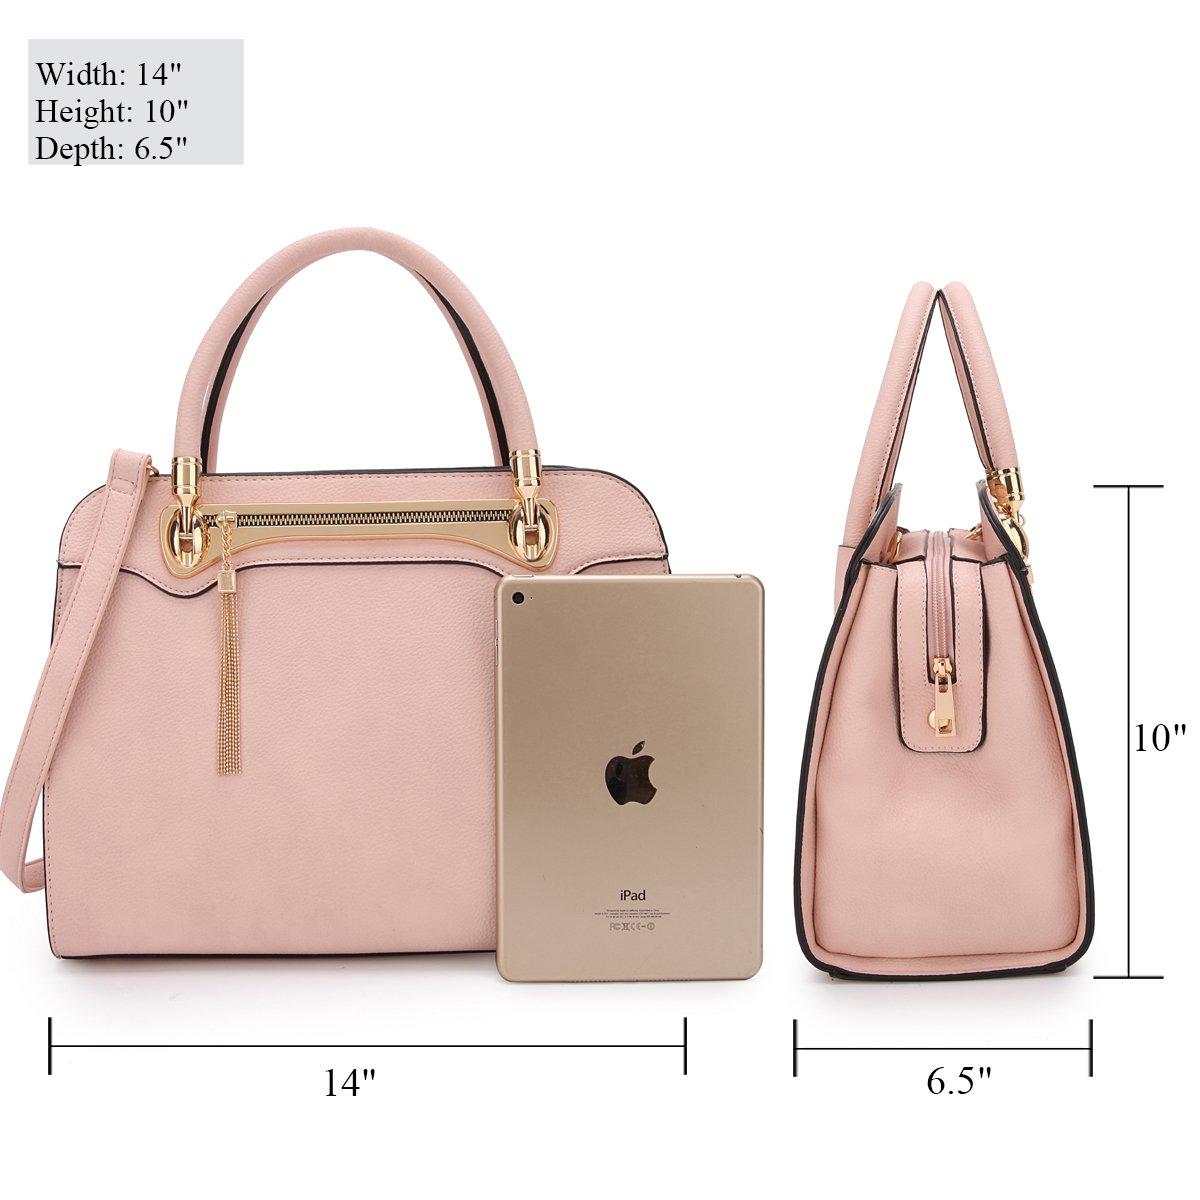 Women Structured Satchel Bags Vegan Leather Handbag Top Handle Purse Fashion Shoulder Bag with Fringed Tassel by Dasein (Image #2)